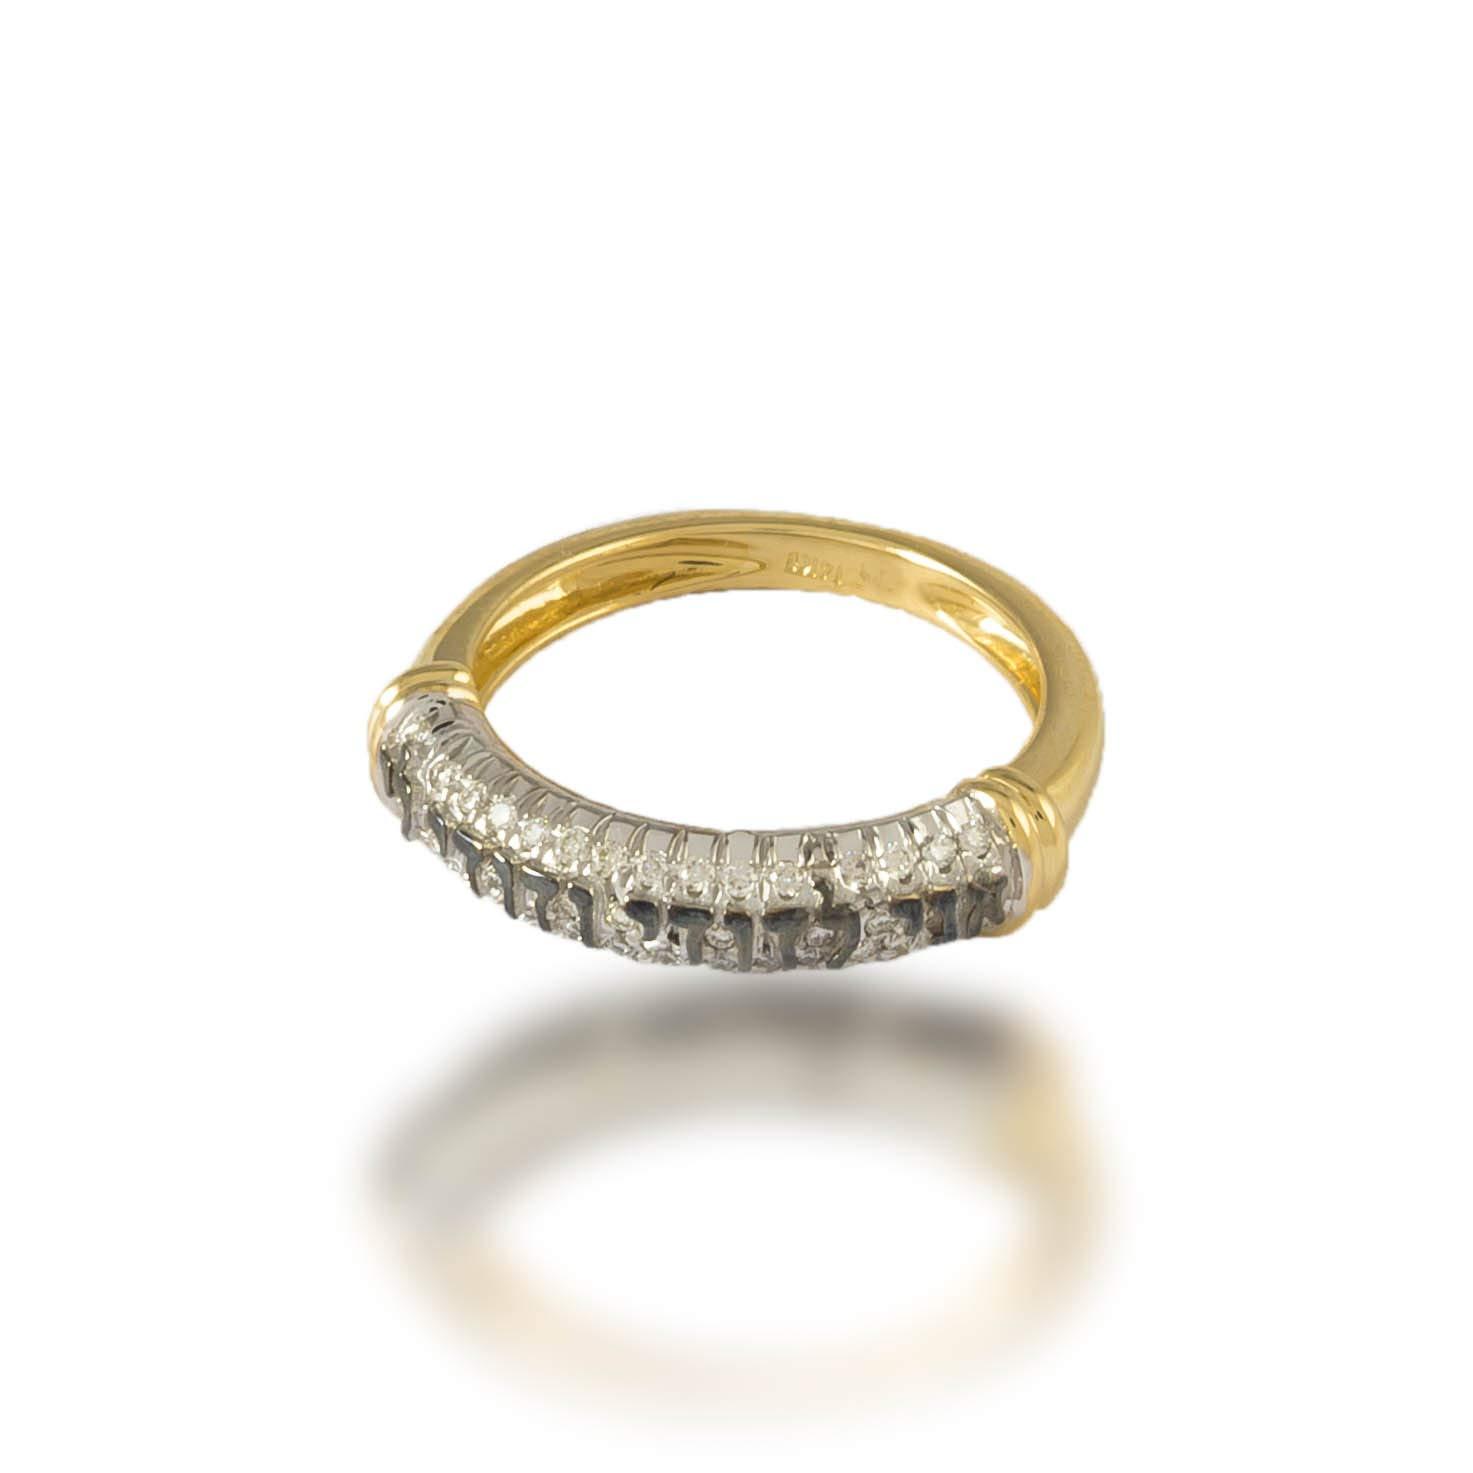 This is an image of Amazon.com: Ani Ledodi Vedodi Li Diamond Ring 43k Yellow Gold Ring